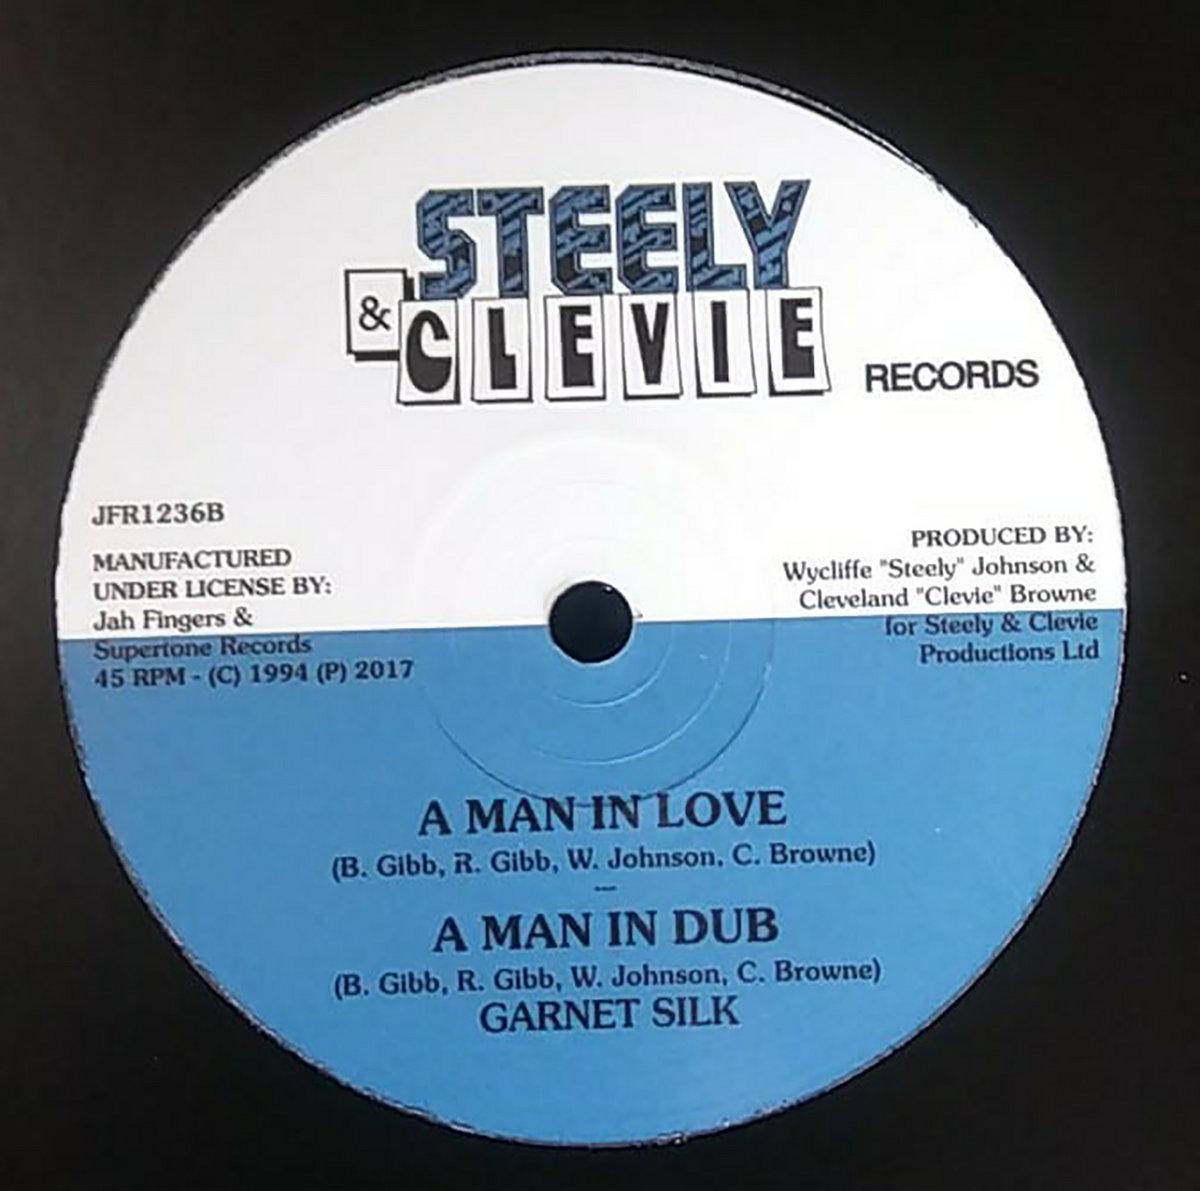 Garnett Silk & Steely & Clevie - Love Is the Answer + A Man